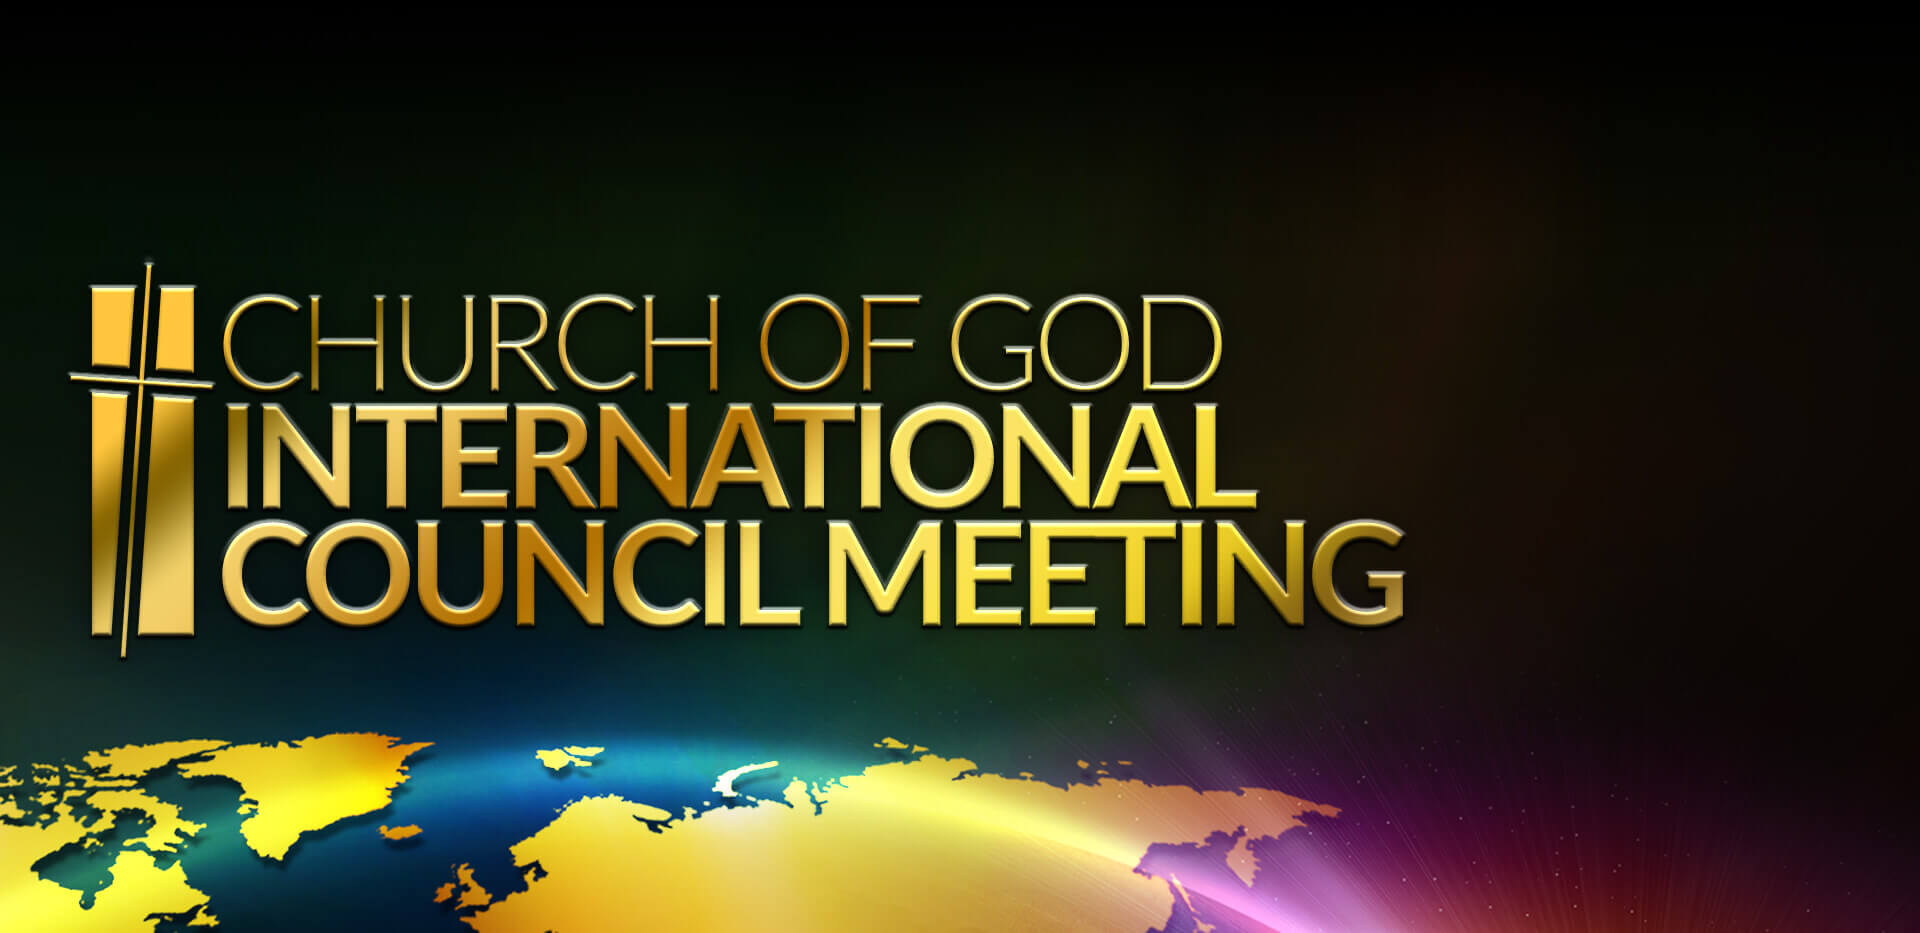 International Council Meeting 2017